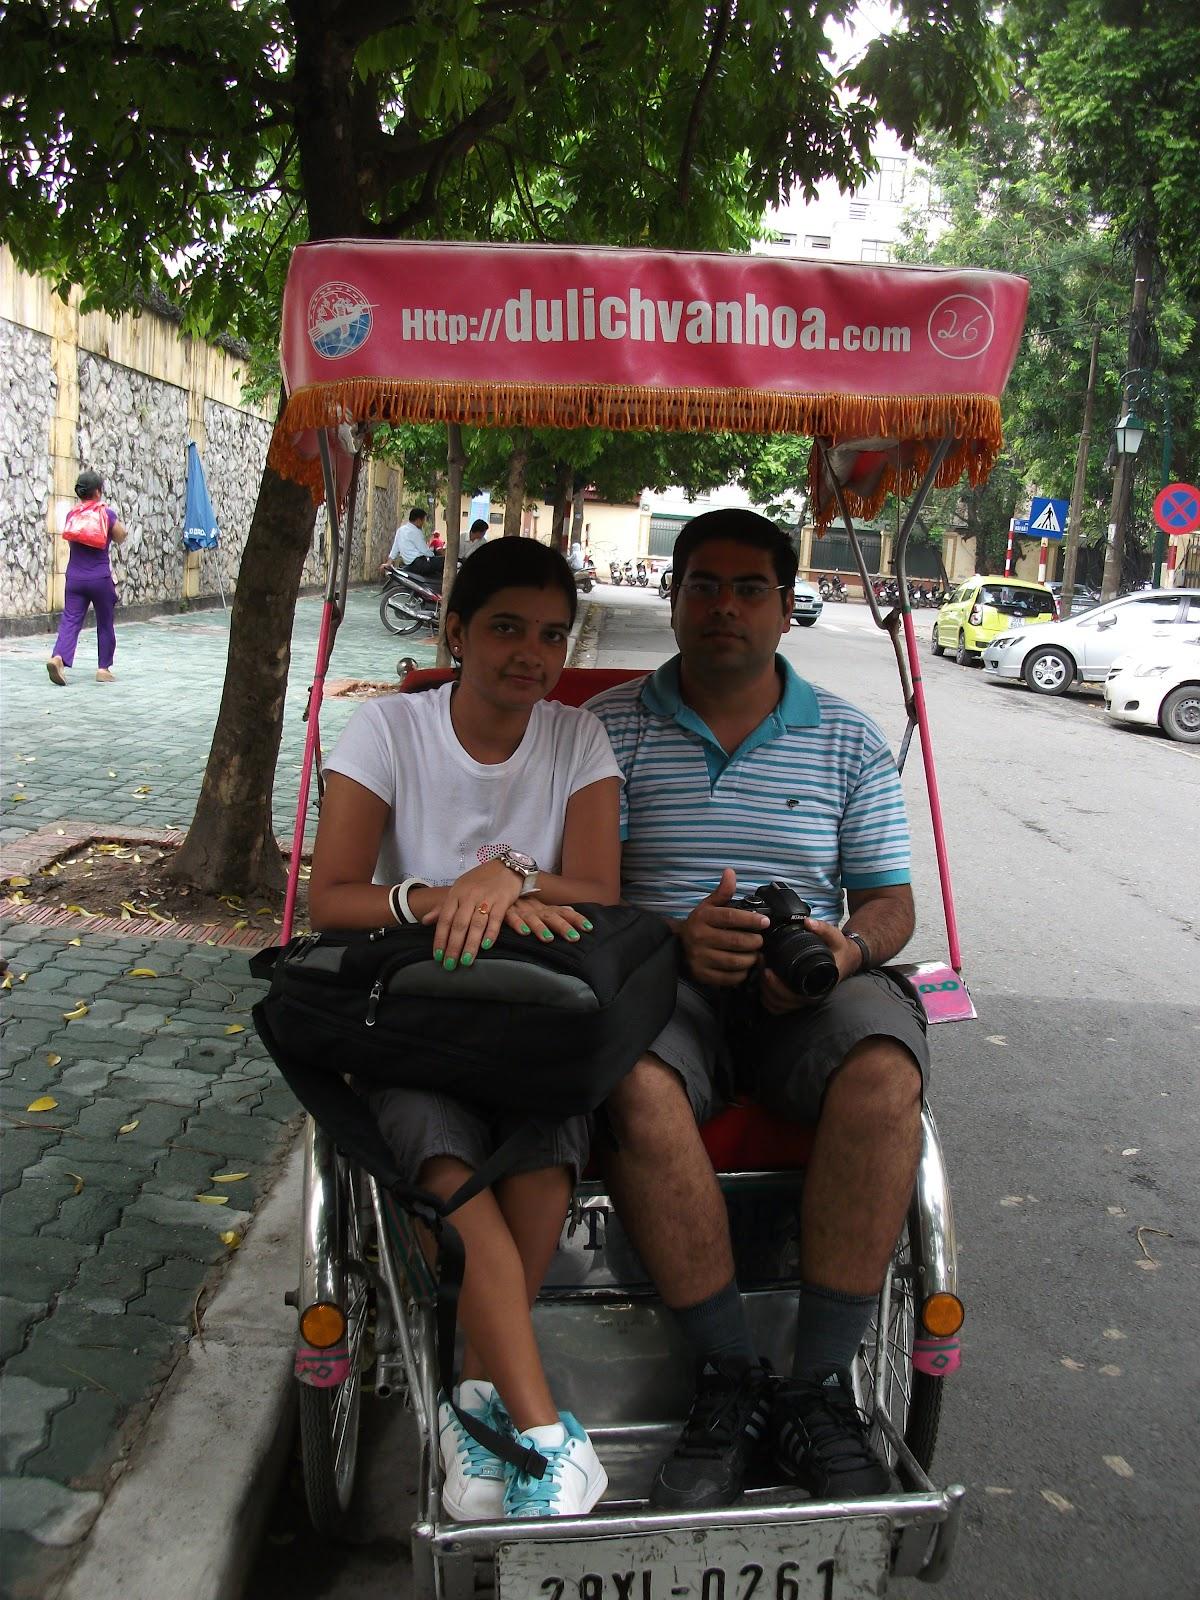 Rickshaw in old town , hanoi